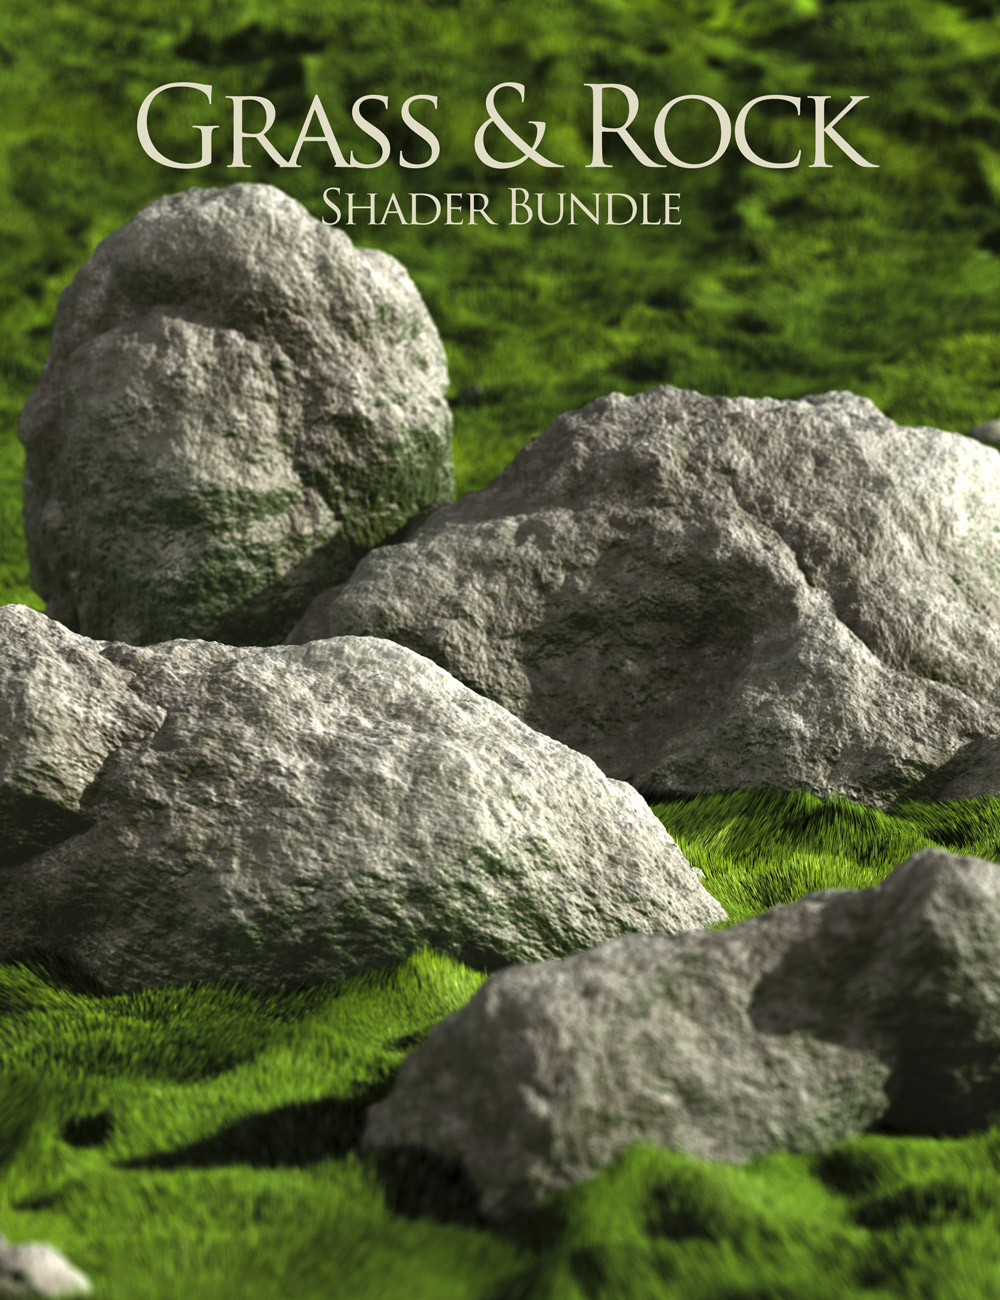 Rock & Grass Bundle by: DimensionTheory, 3D Models by Daz 3D